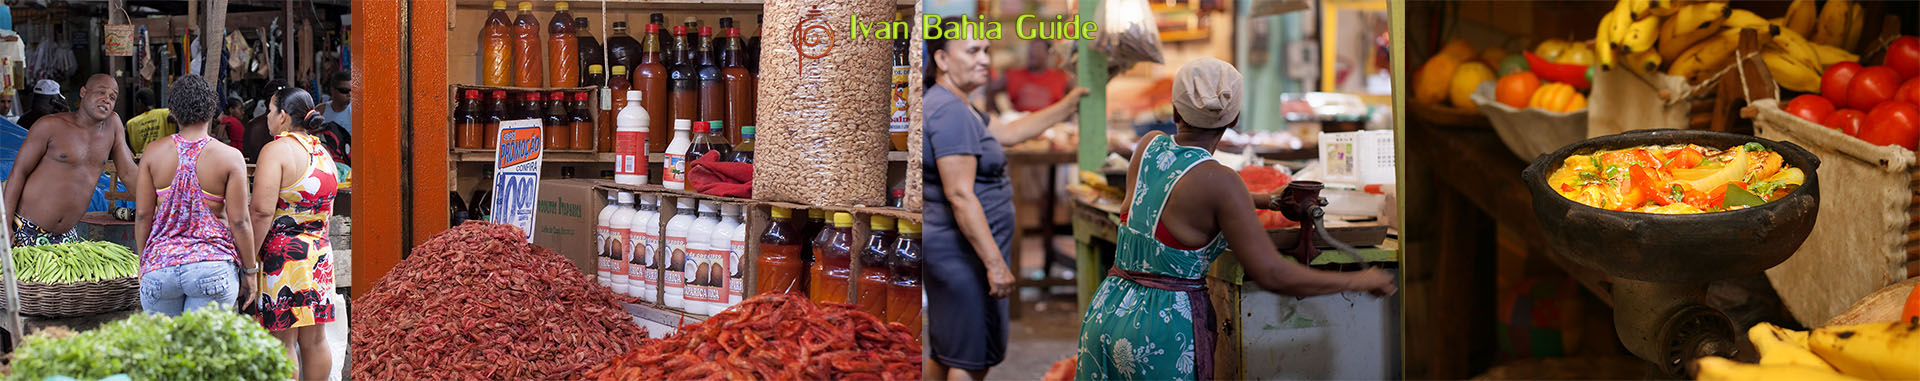 Ivan Bahia Guide, buy fish & vegetables on the market and learn to cook moqueca with your personal Chef  #ivanbahiaguide #ivanbahiareisgids #bestofbrazil #ibg #bahiametisse #fotosbahia #salvadorbahiabrazil #bahiatourism #ibtg  #ivansalvadorbahia #salvadorbahiatravel #toursbylocals #fernandobingretourguide #fotoschapadadiamantina  #chapadadiamantinatransfer #SalvadorTourGuide #chapadadiamantinatrekking #lencois #lençois #gaytravelbrazil #homotravel #brazilhoneymoon #diamantinamountains #valedopati #valecapao #bahia #morropaiinacio #chapadadiamantinaguide #discoverbrazil #Guidedetourismesalvadorbahiabresil #TransatJacquesVabres #SailingBrazil #maurotours #bahiatopturismo #transfervipsalvador #bahiapremium #booktransfer #maisbahiaturismo #cassiturismo